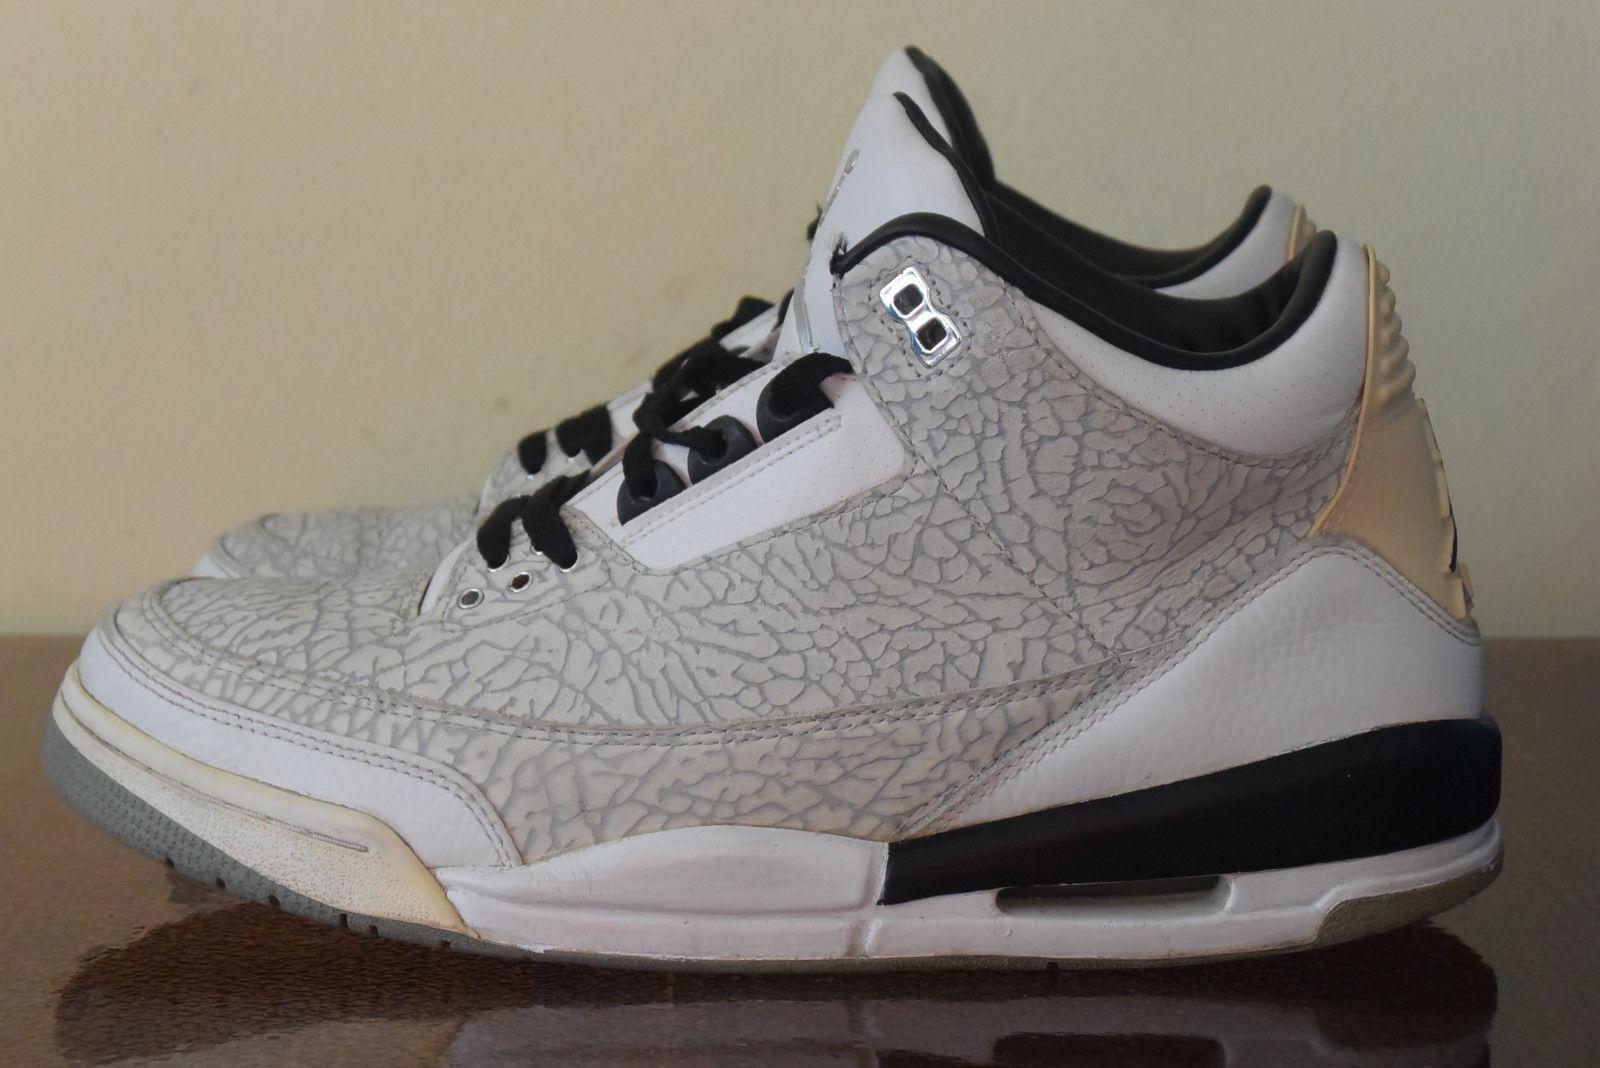 Nike Air Jordan 3 Retro Flip White Black Cement 315767-101 Sz. 10.5